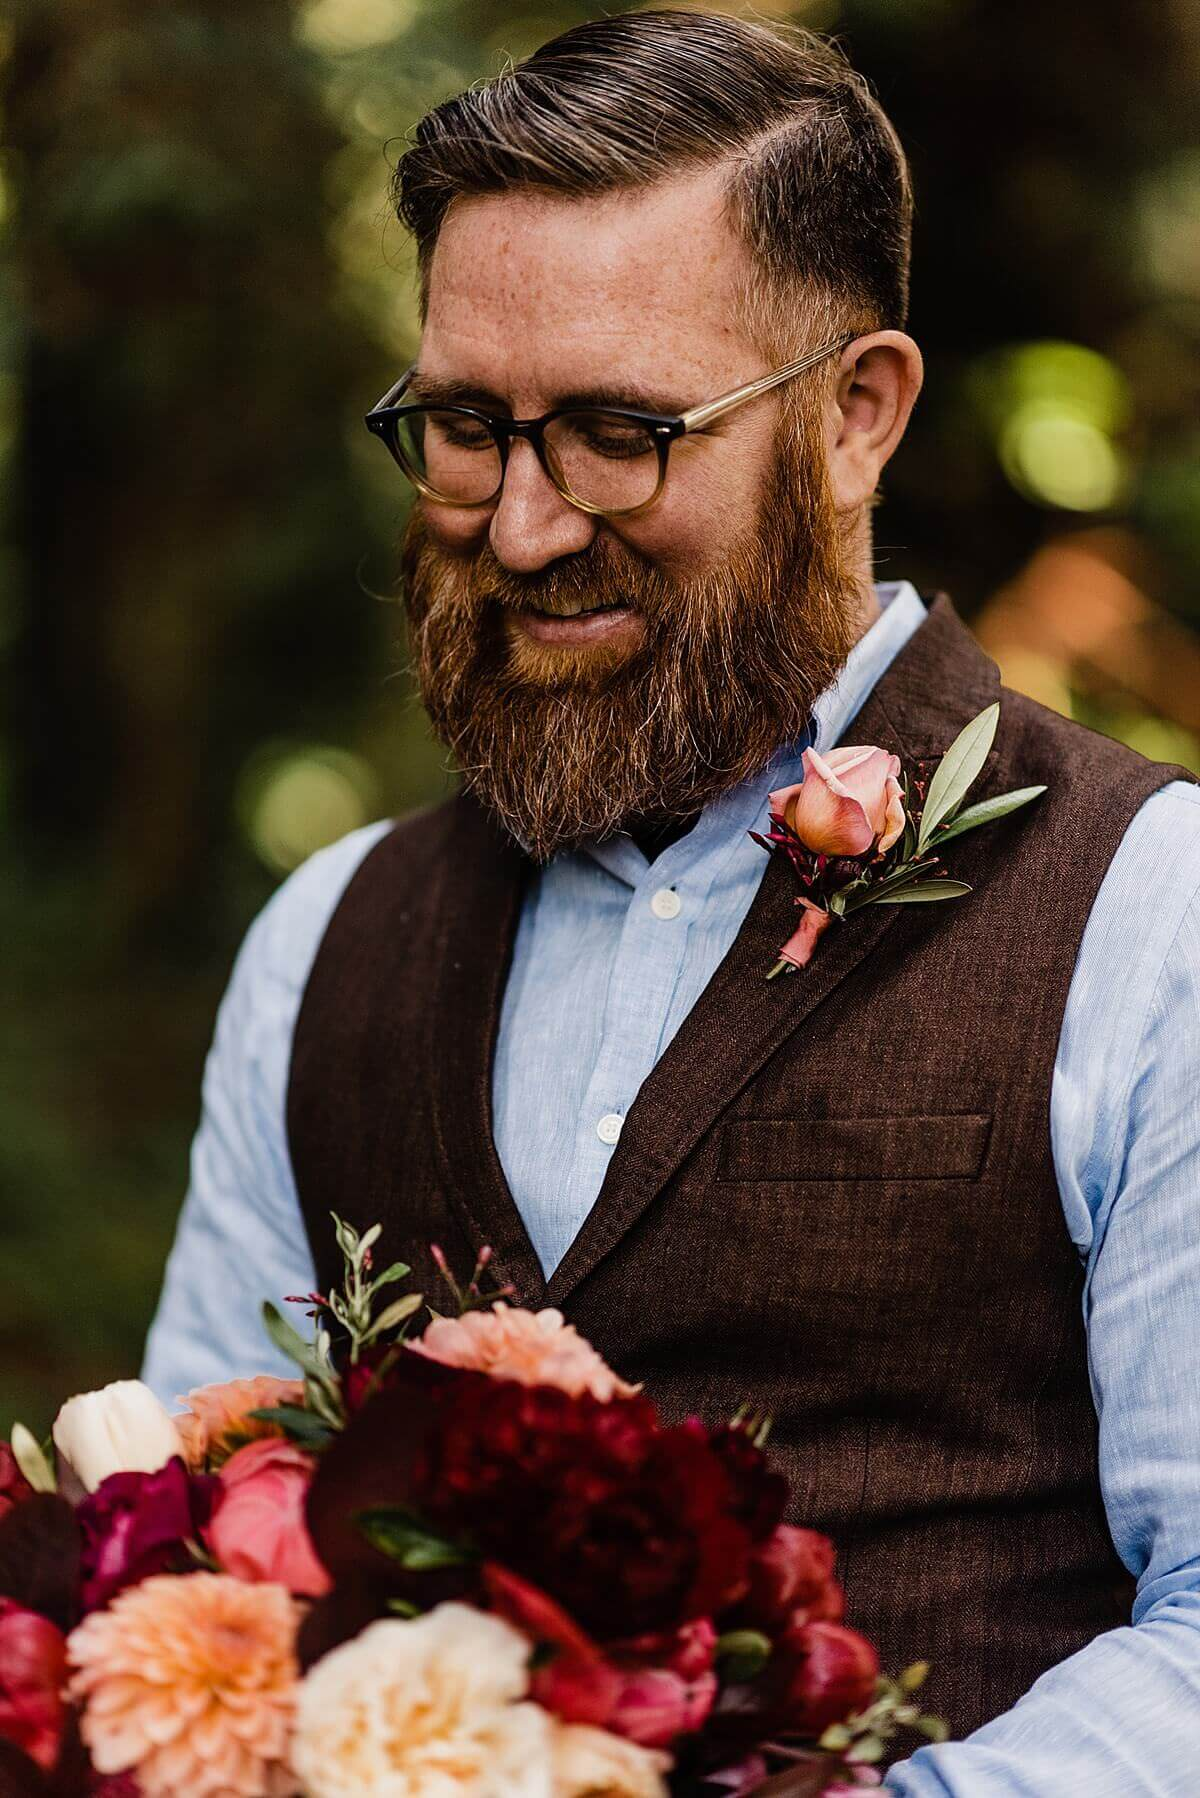 Allison-Brooks-Jedediah-Smiith-Redwoods-Adventure-Elopement-Wedding-S-Photography-Blog_0019.jpg